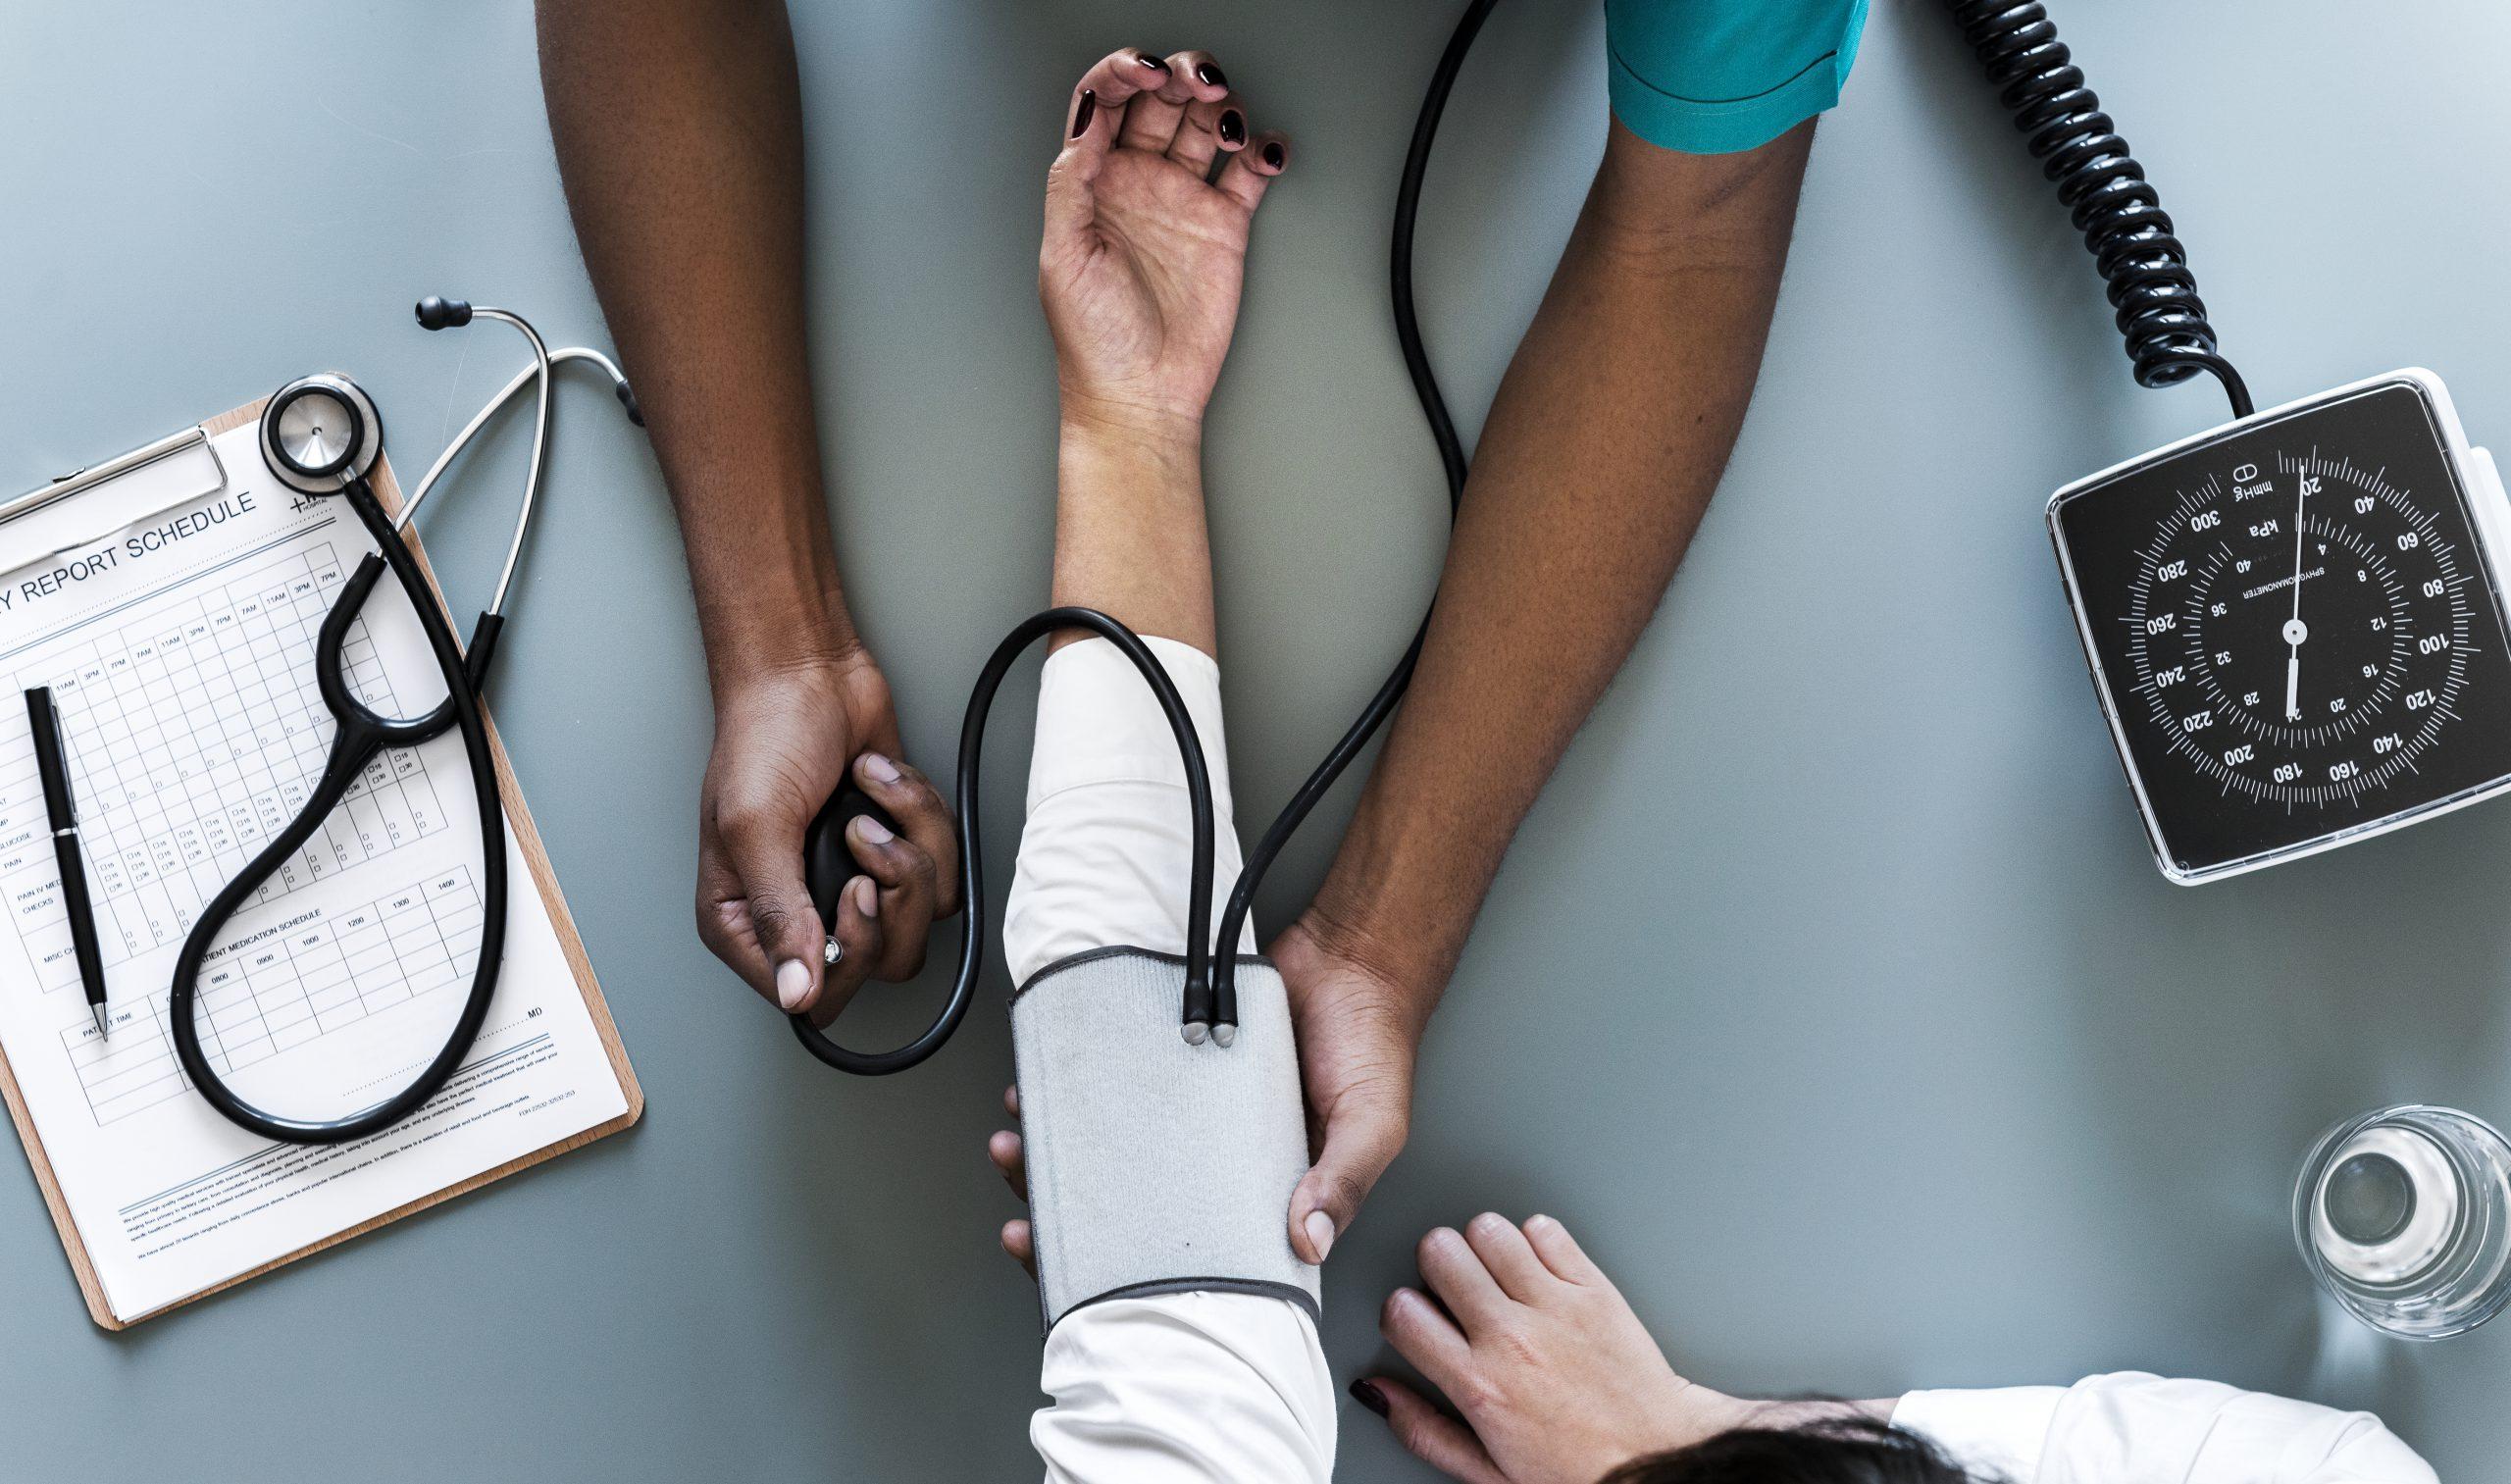 الفحص الطبی | Healtha - Medical Tourism in Iran